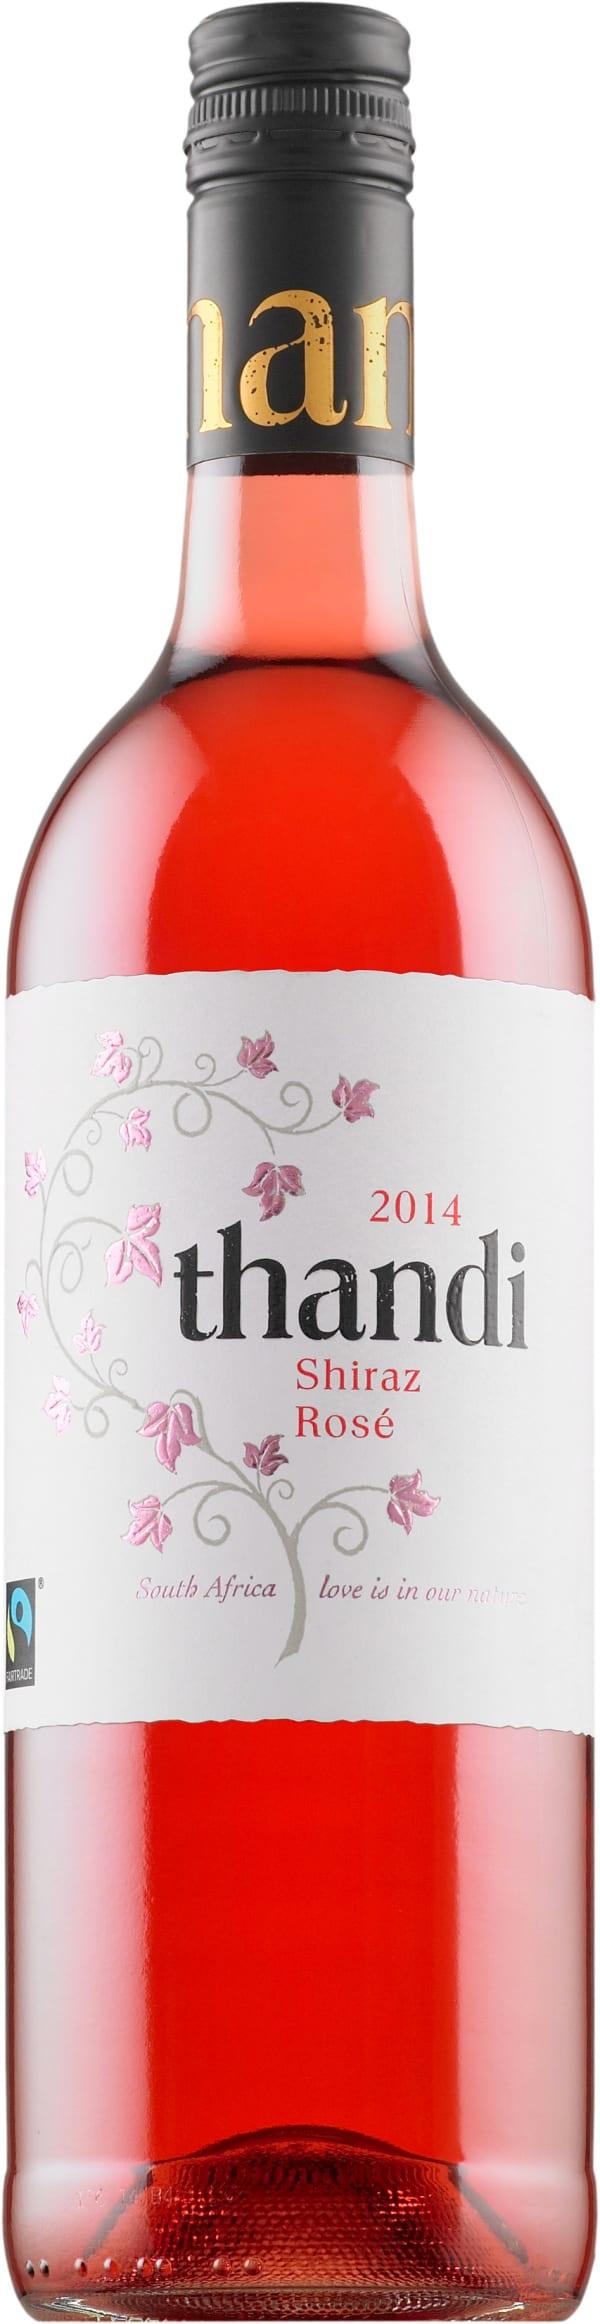 Thandi Shiraz Rosé 2017